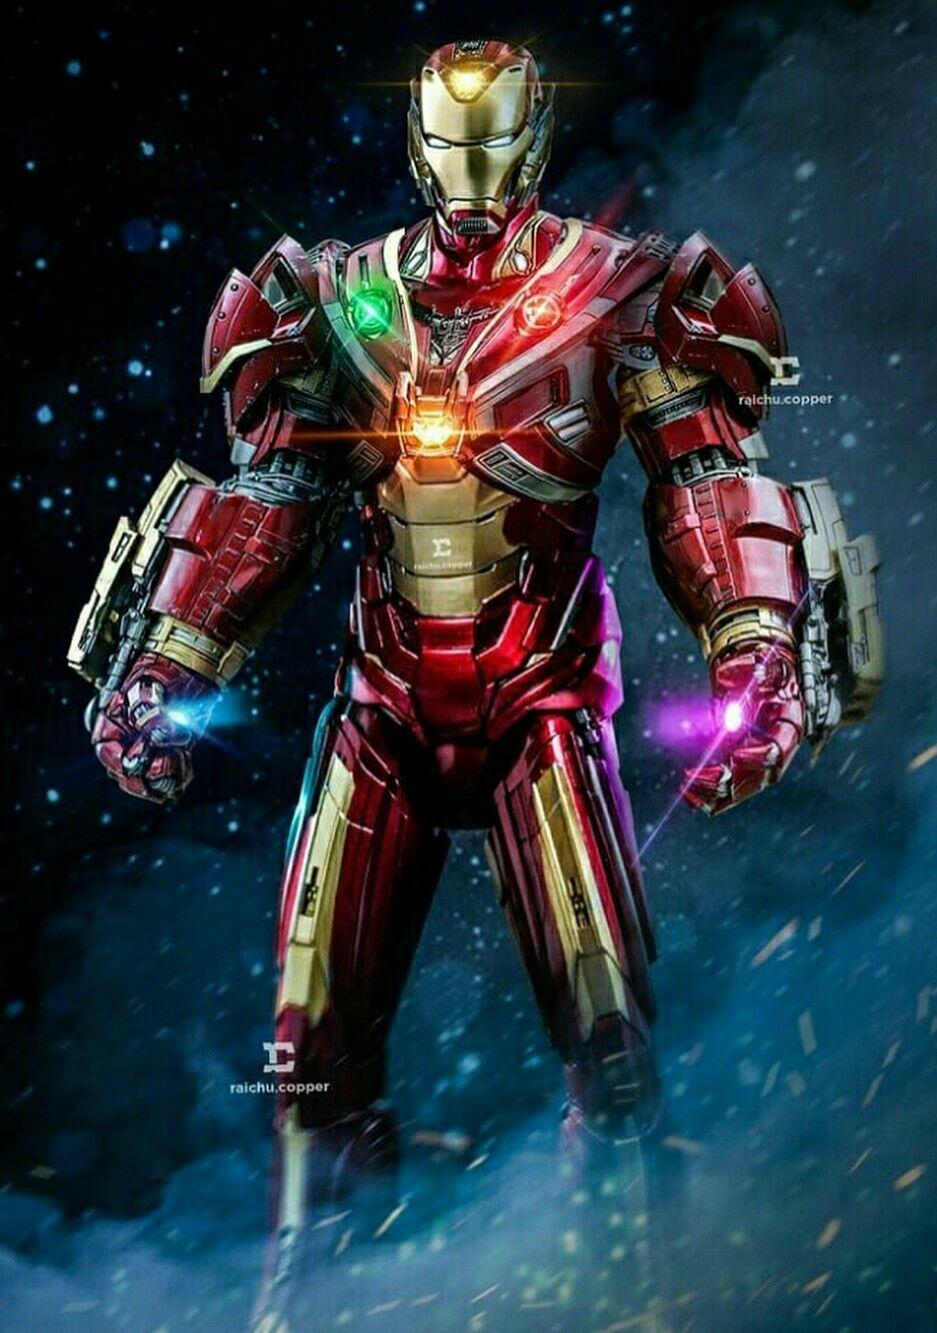 Pin By Sedric Rosenburg On Marvel Universe Marvel Superhero Posters Iron Man Avengers Marvel Iron Man Iron man infinity war suit hd wallpaper